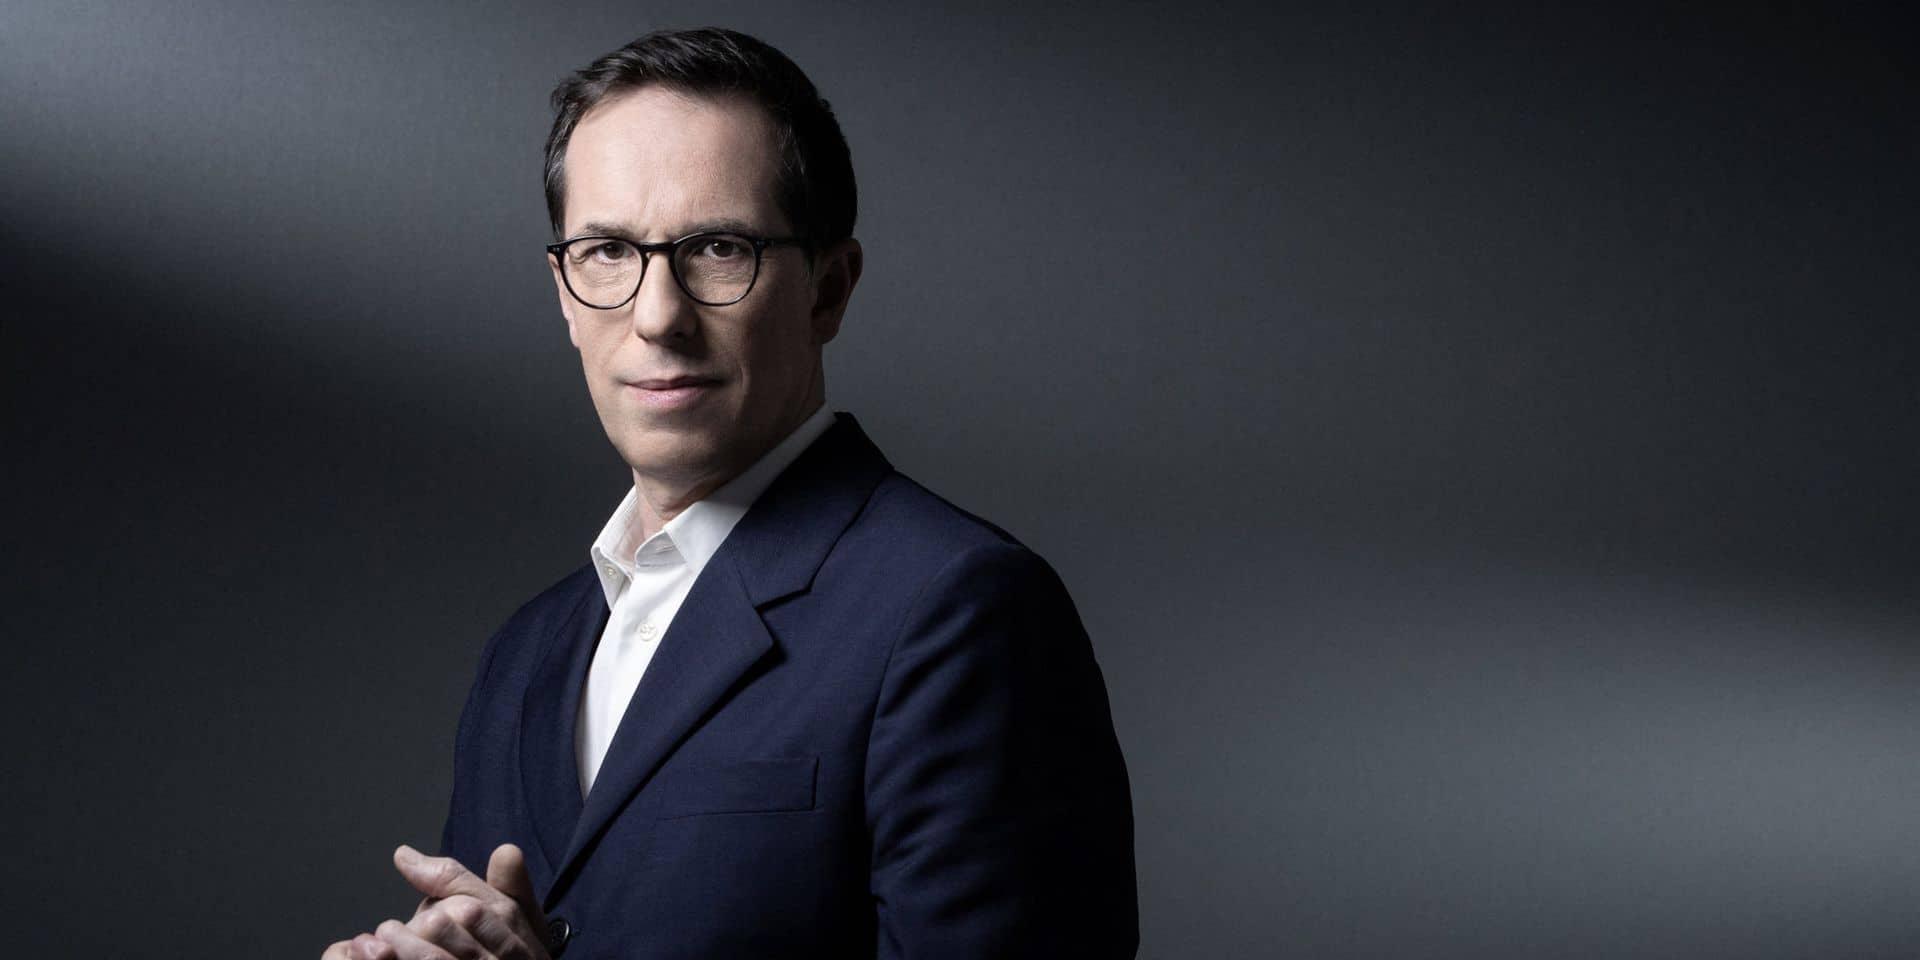 Le Chief Executive Officer (CEO) de L'Oréal au 1er mai, Nicolas Hieronimus.